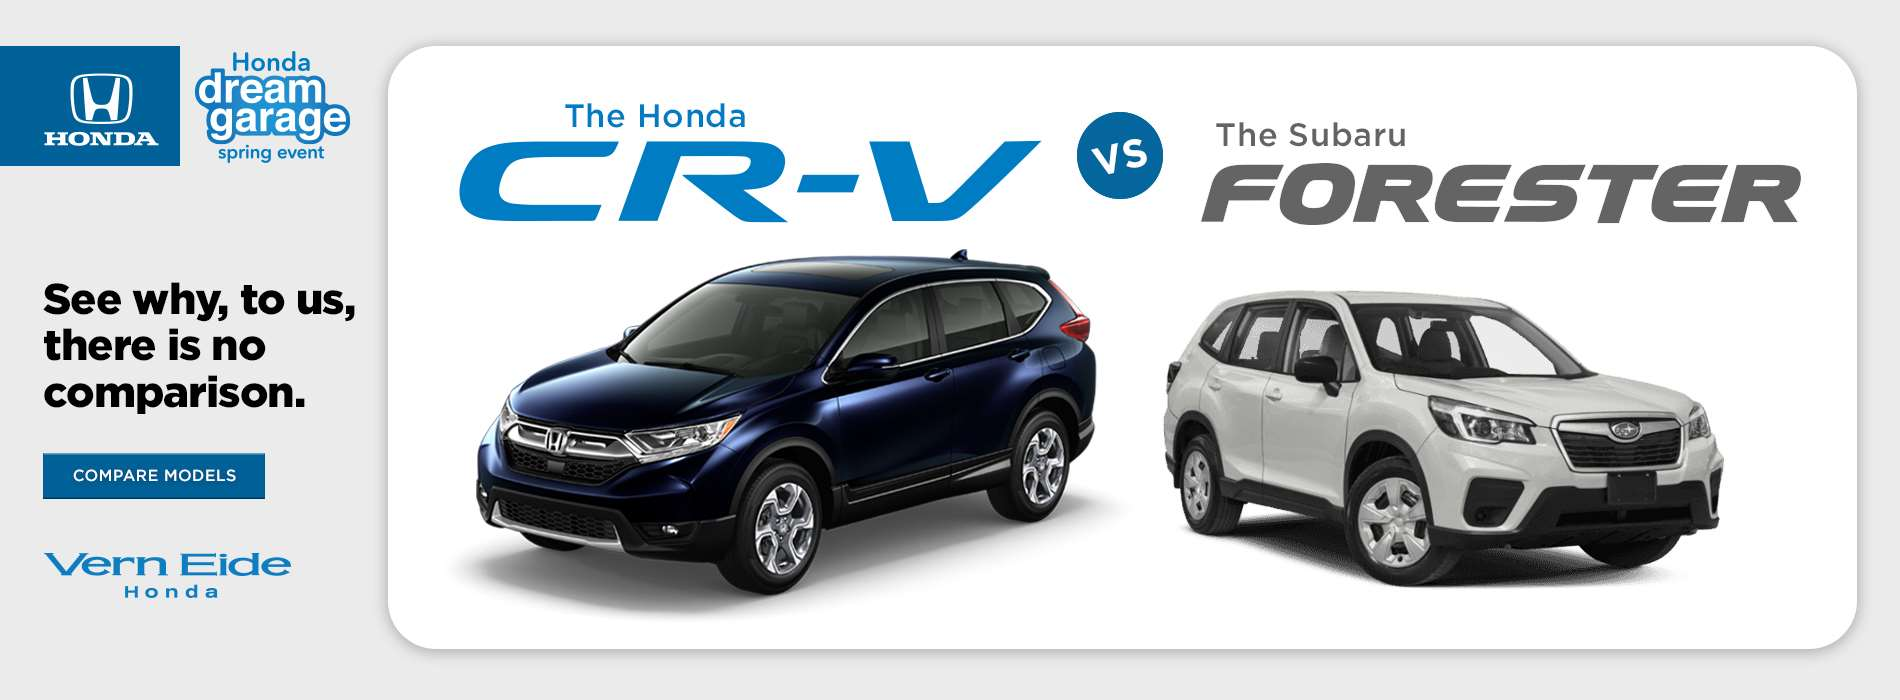 Honda - CR-V vs Forester - March 2019